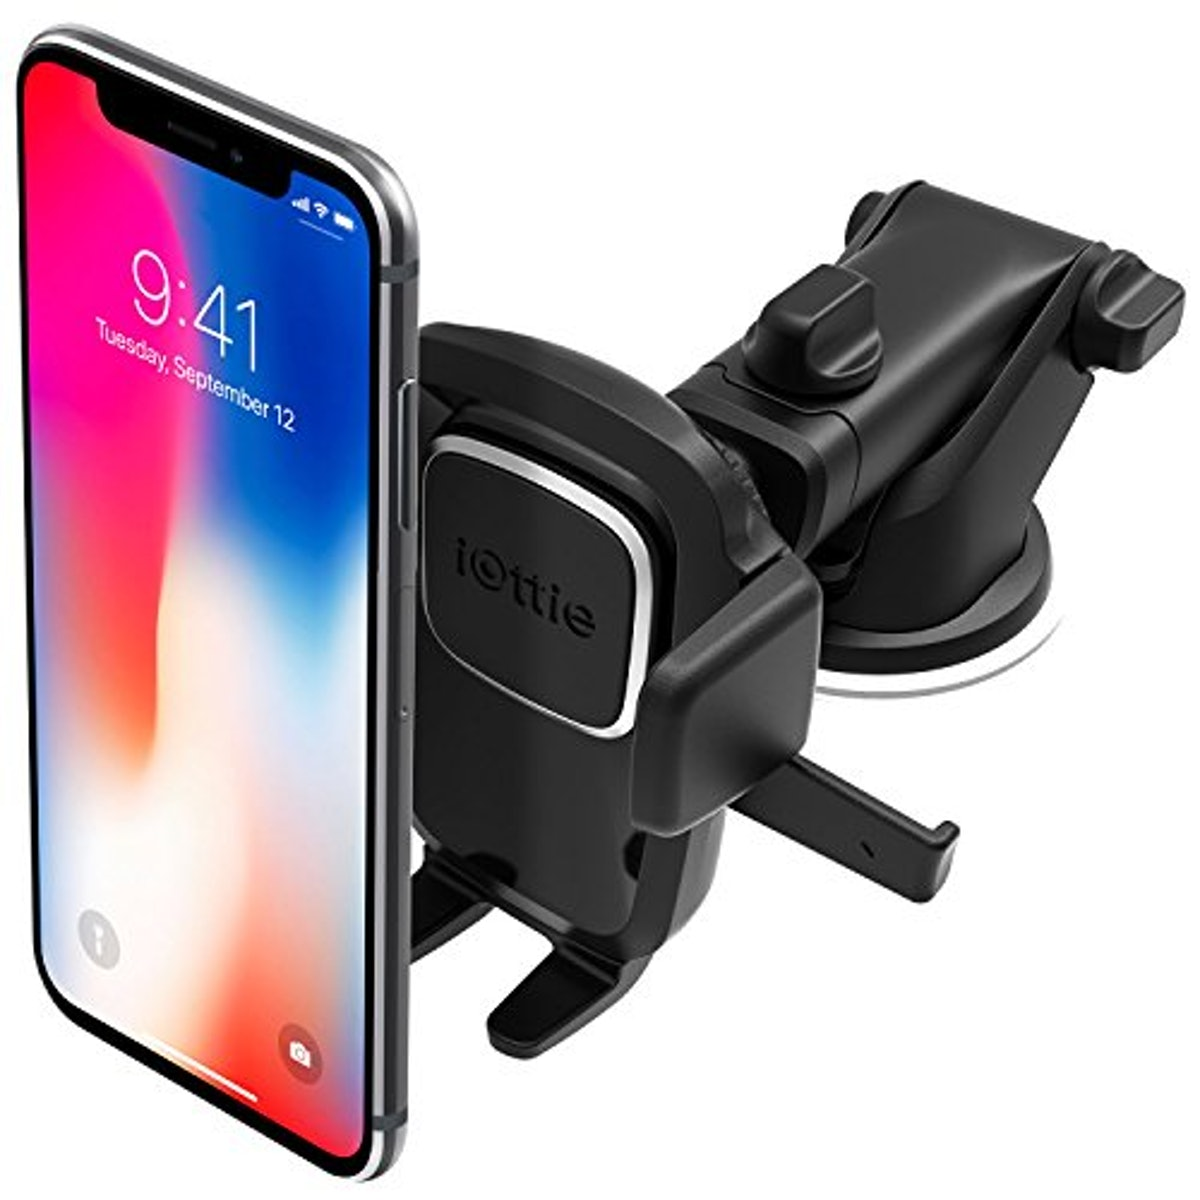 iOttie Phone Mount for Car